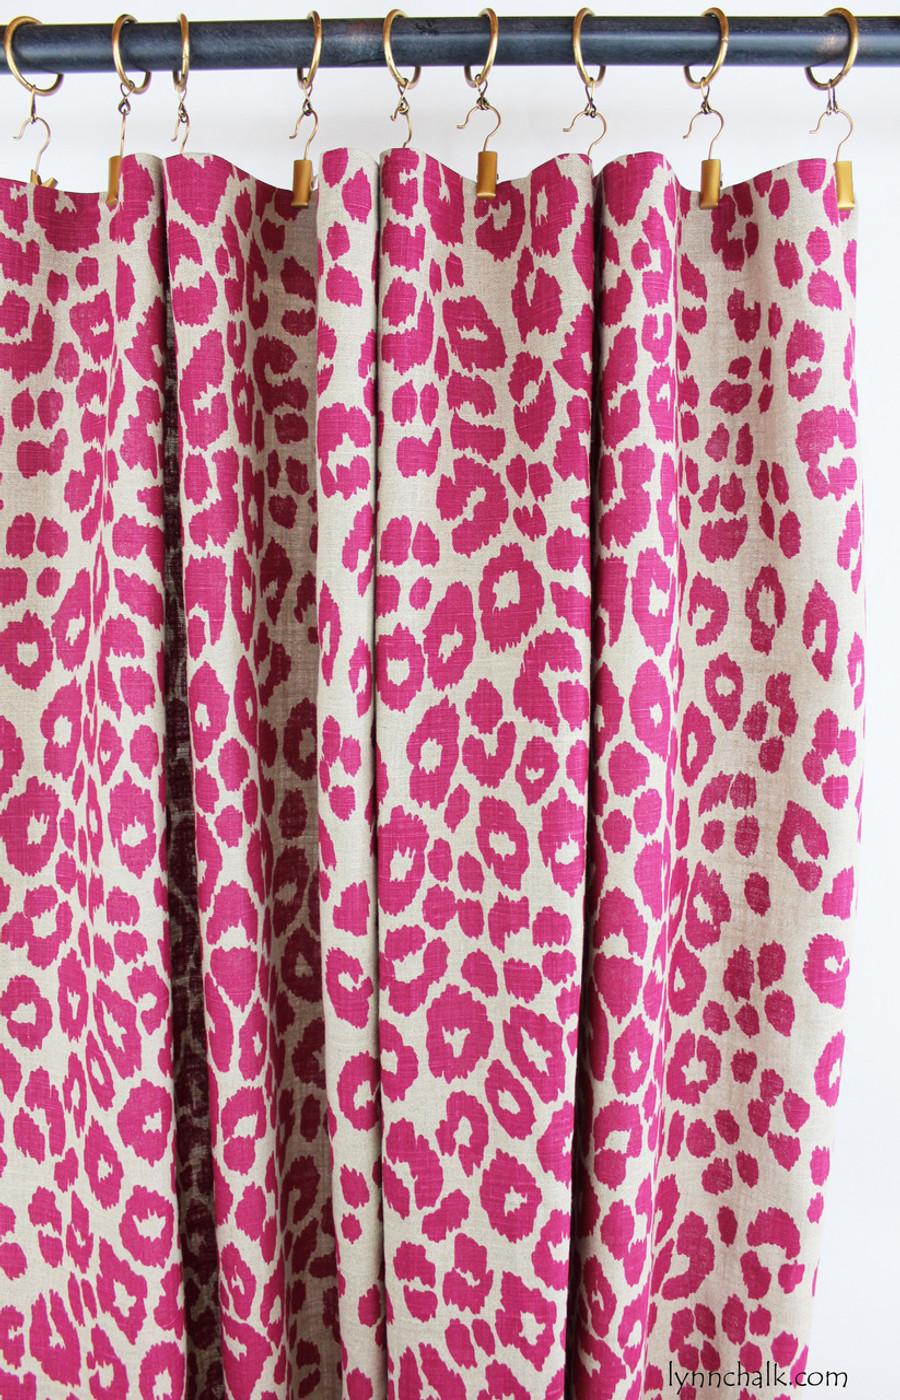 Custom Flat Panels by Lynn Chalk in Schumacher Iconic Leopard Fuchsia/Natural